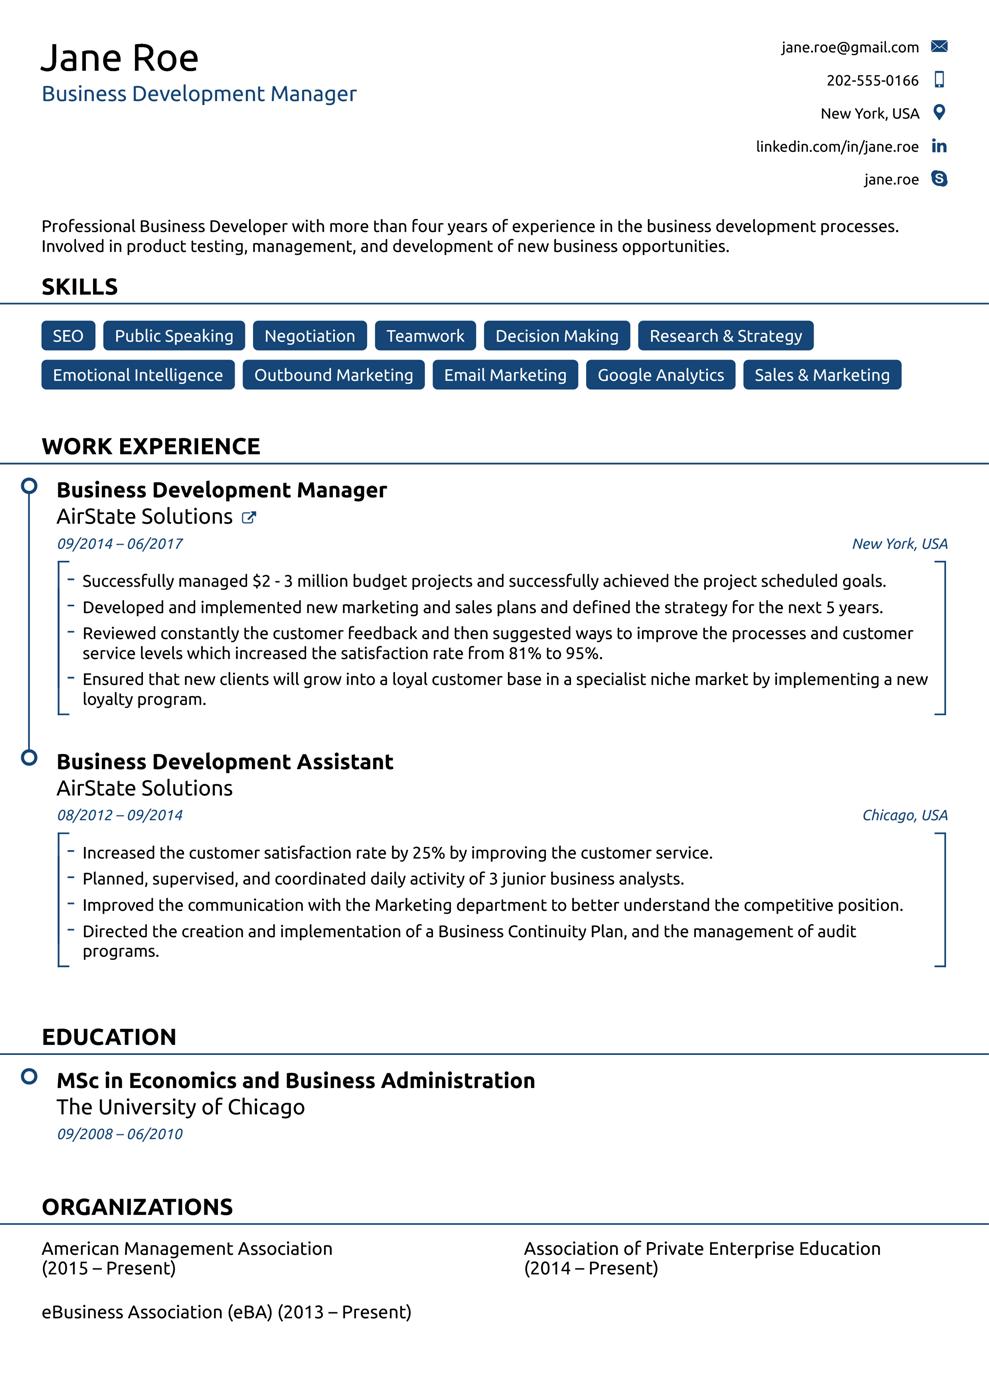 Functional Resume Template Modern Resume Template functional resume template|wikiresume.com